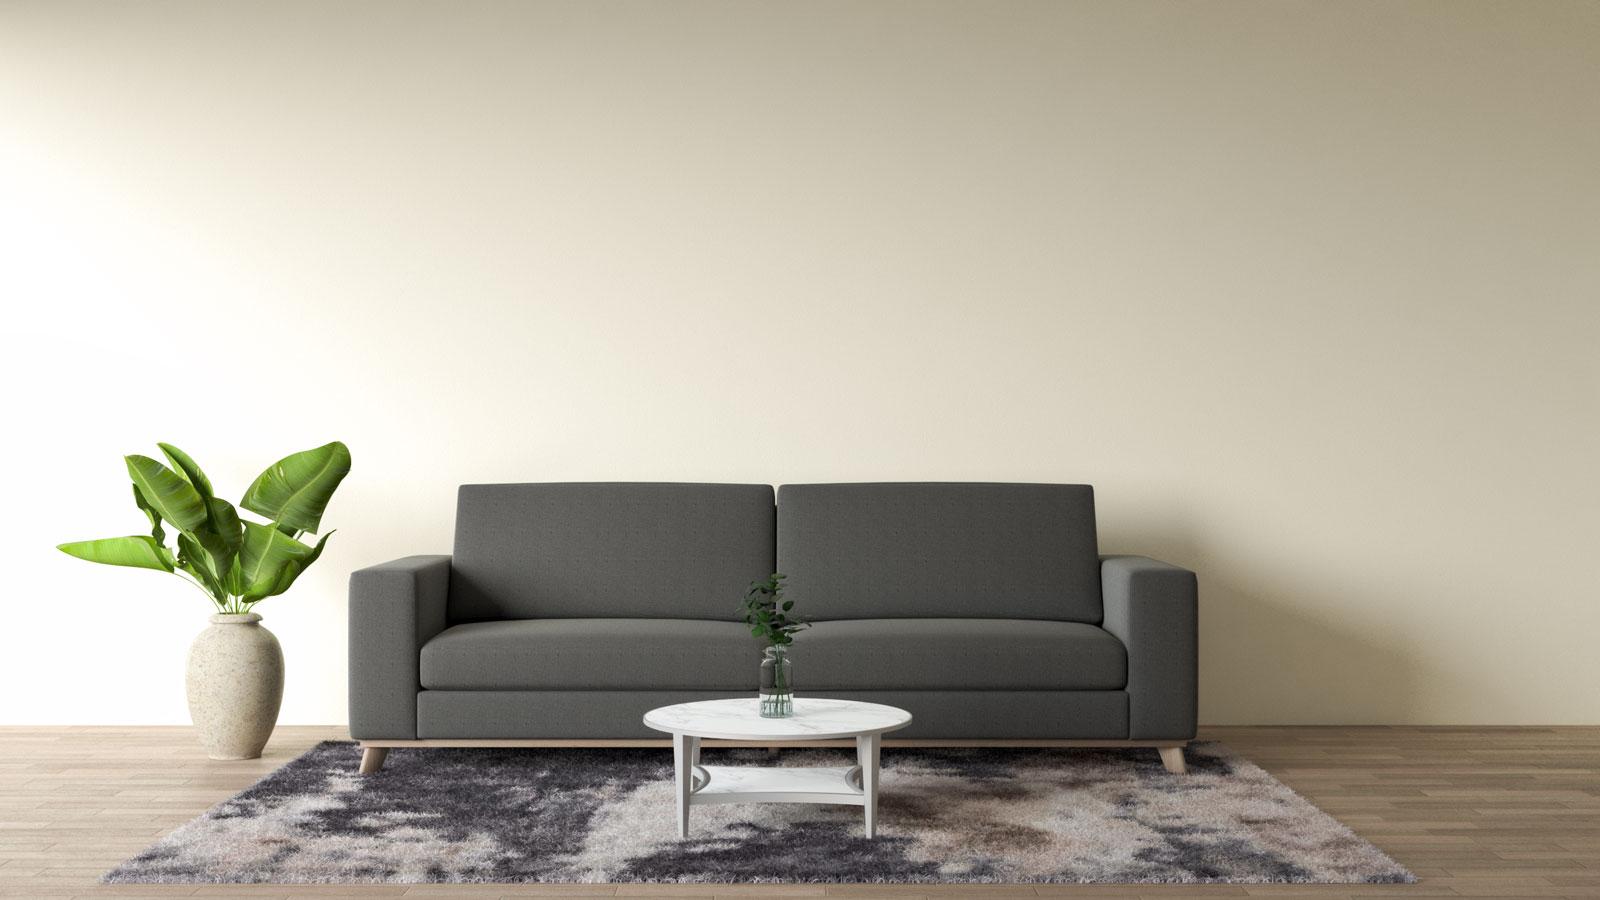 dark gray couches with bright cream walls